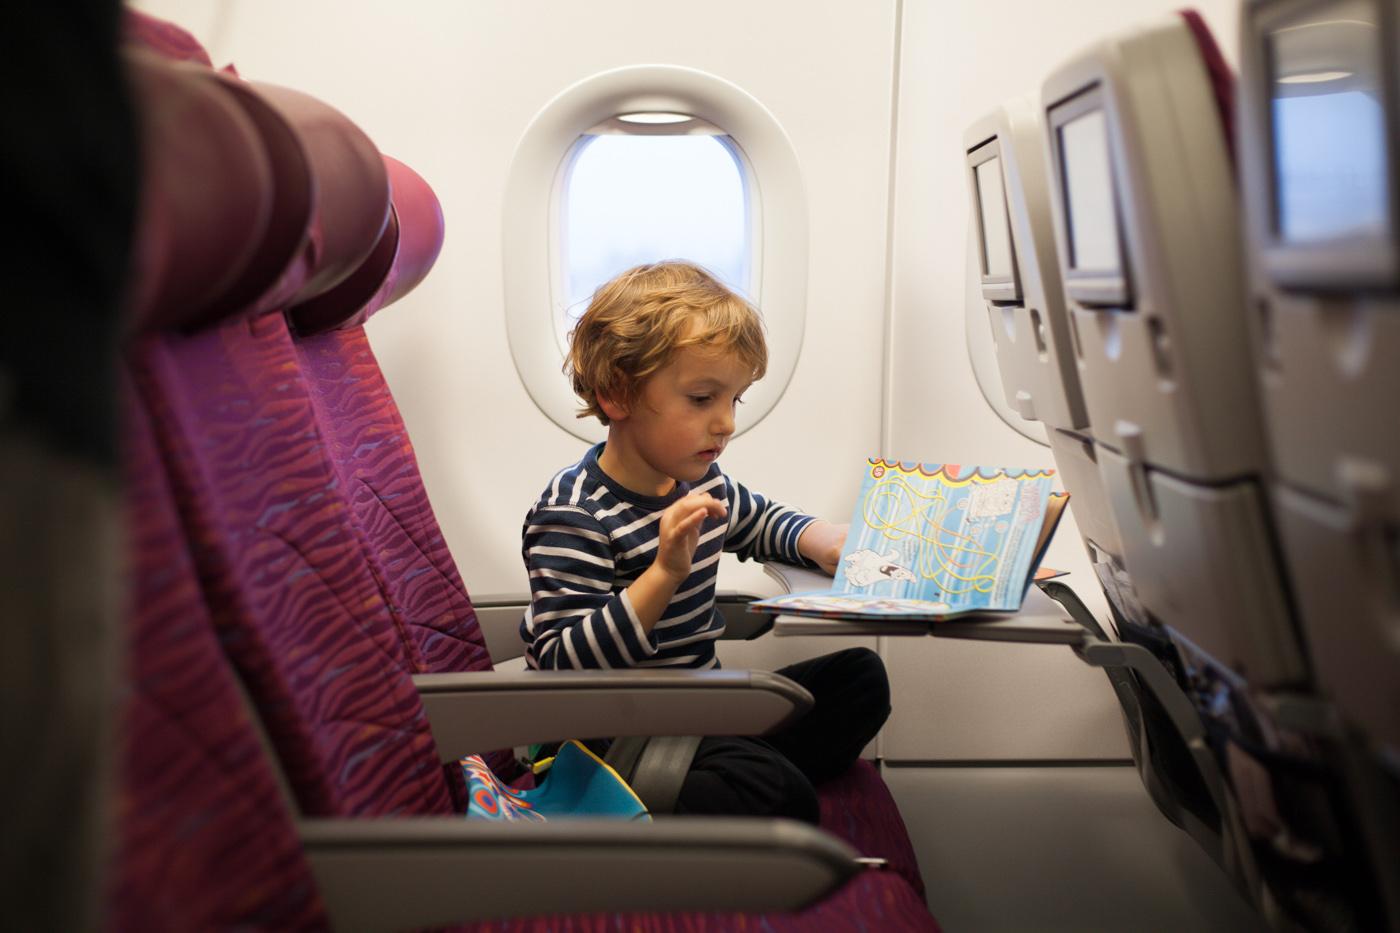 Dete u avionu, Tamara Zidar